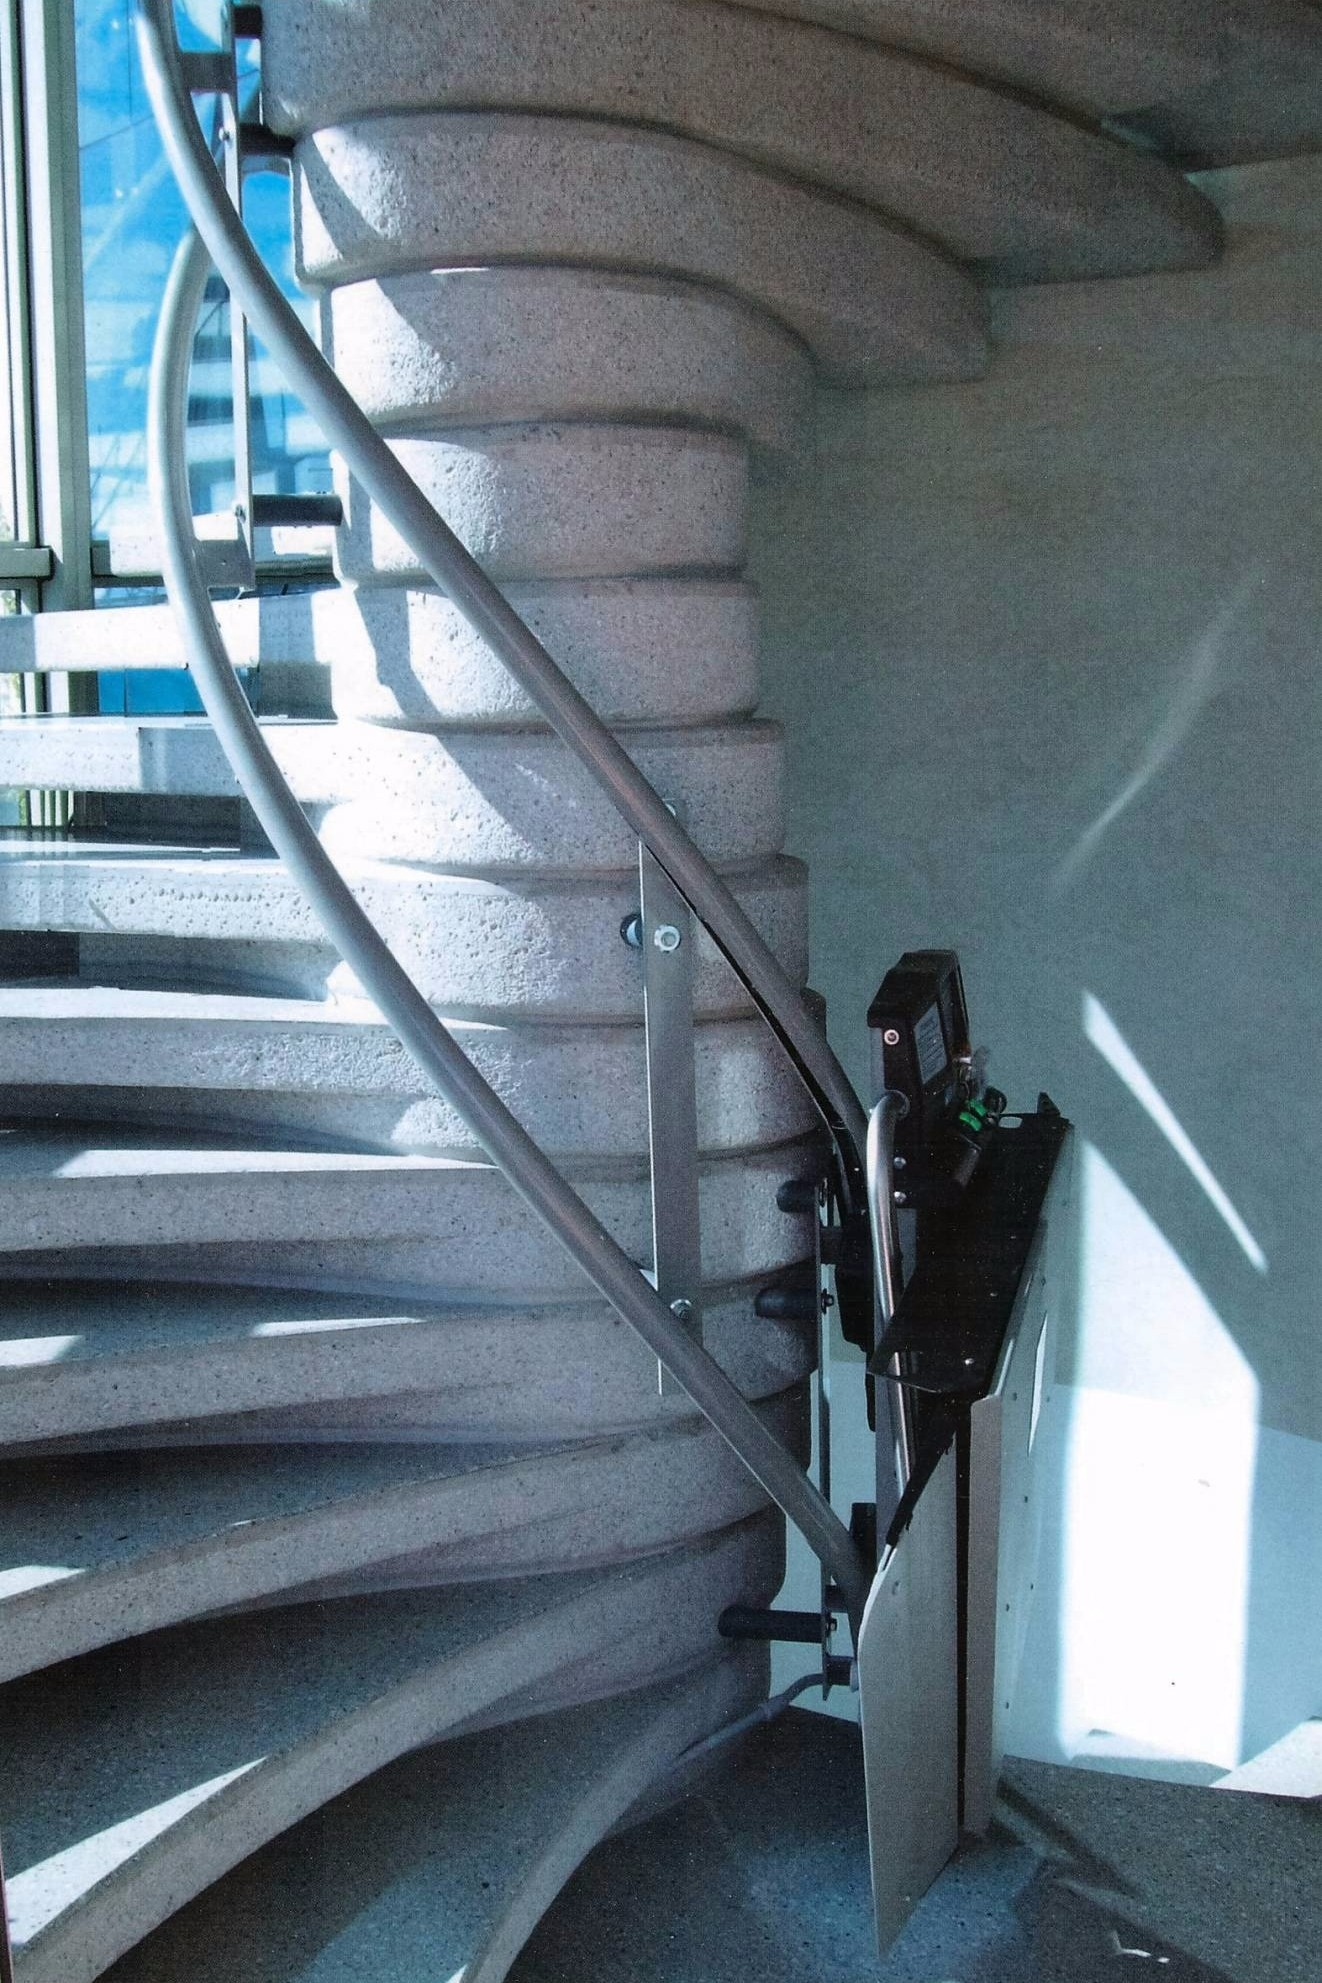 monte escaliers nice. Black Bedroom Furniture Sets. Home Design Ideas